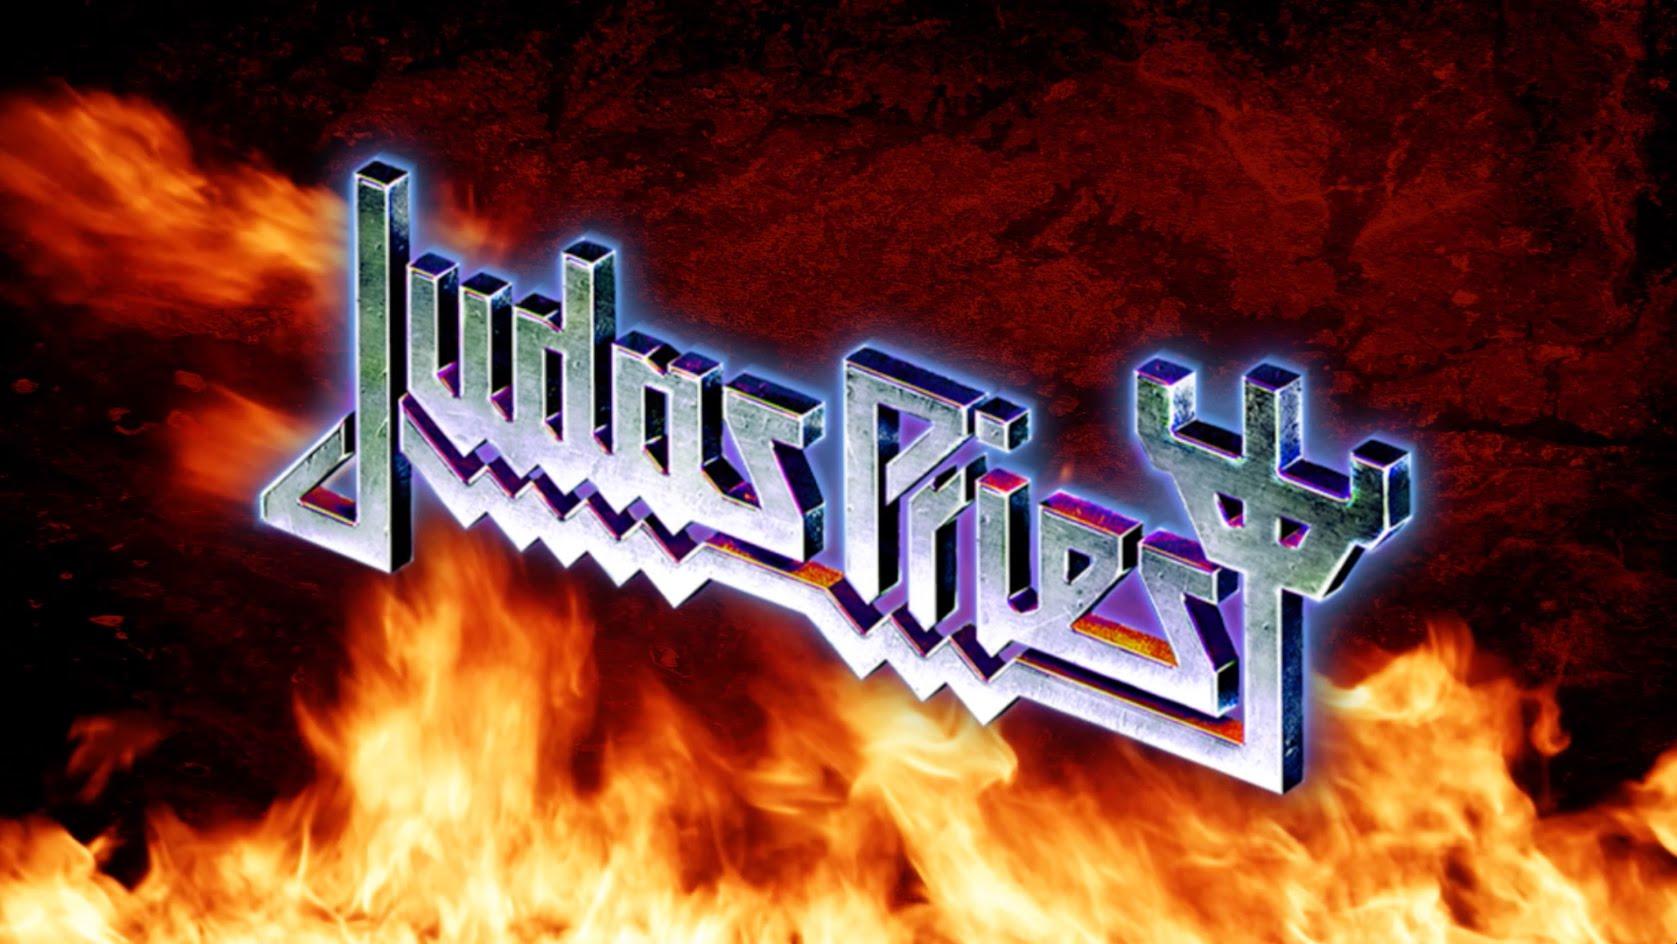 Judas Priest - Glenn Tipton on How Songs Take Shape